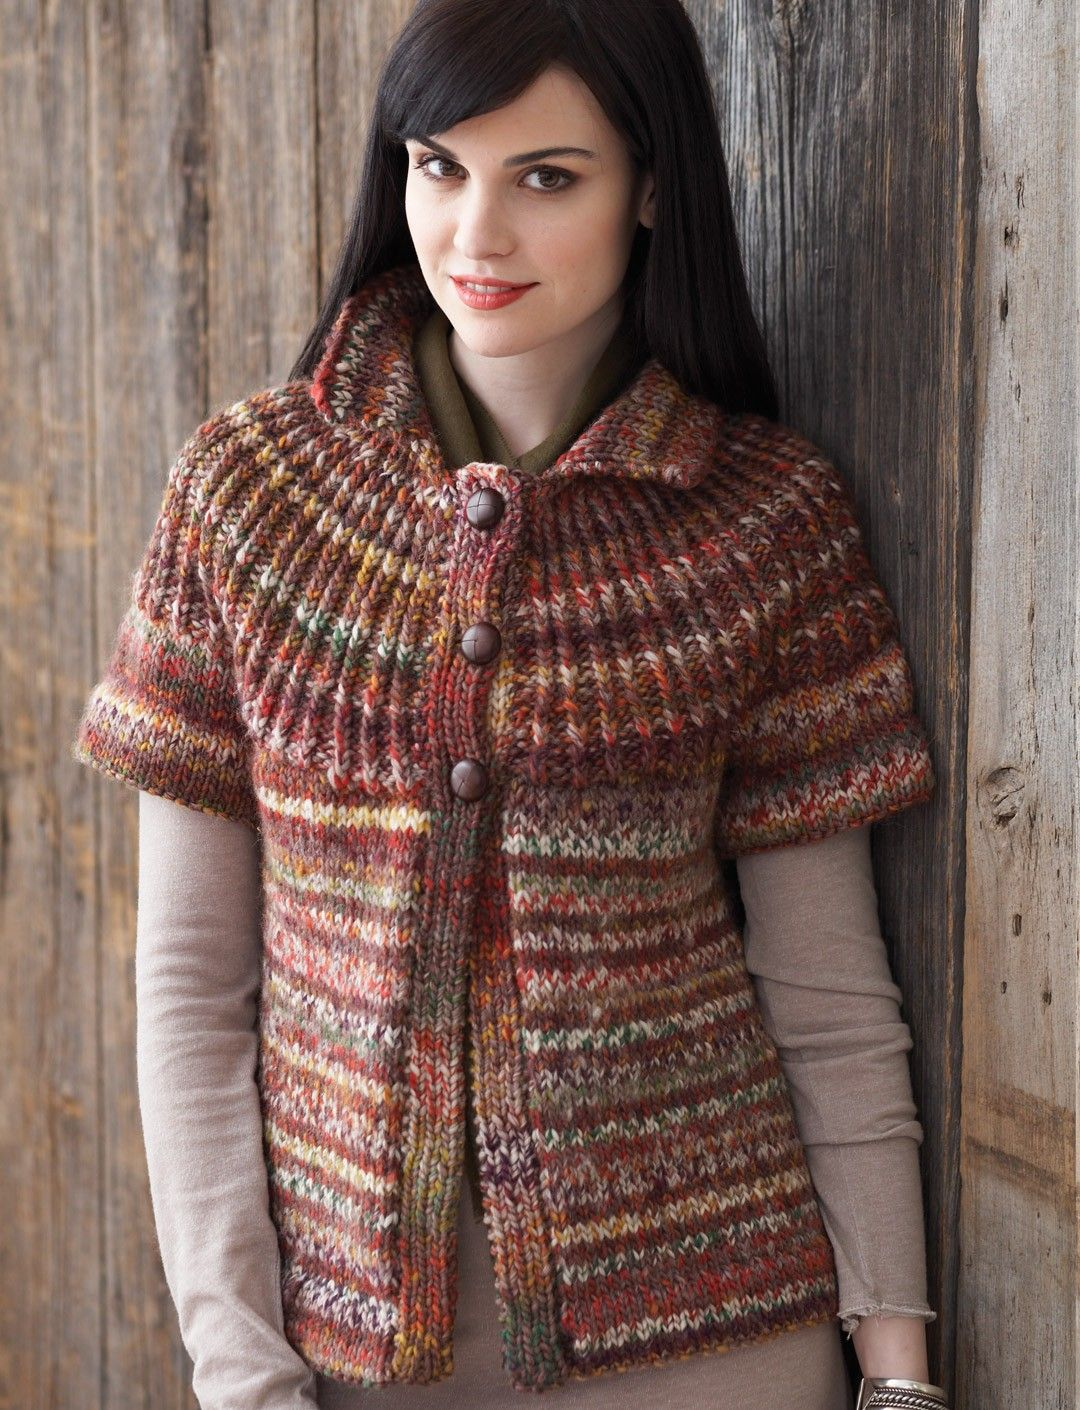 Yarnspirations patons rib yoke cardigan patterns ravelry rib yoke cardigan pattern by patons bankloansurffo Images